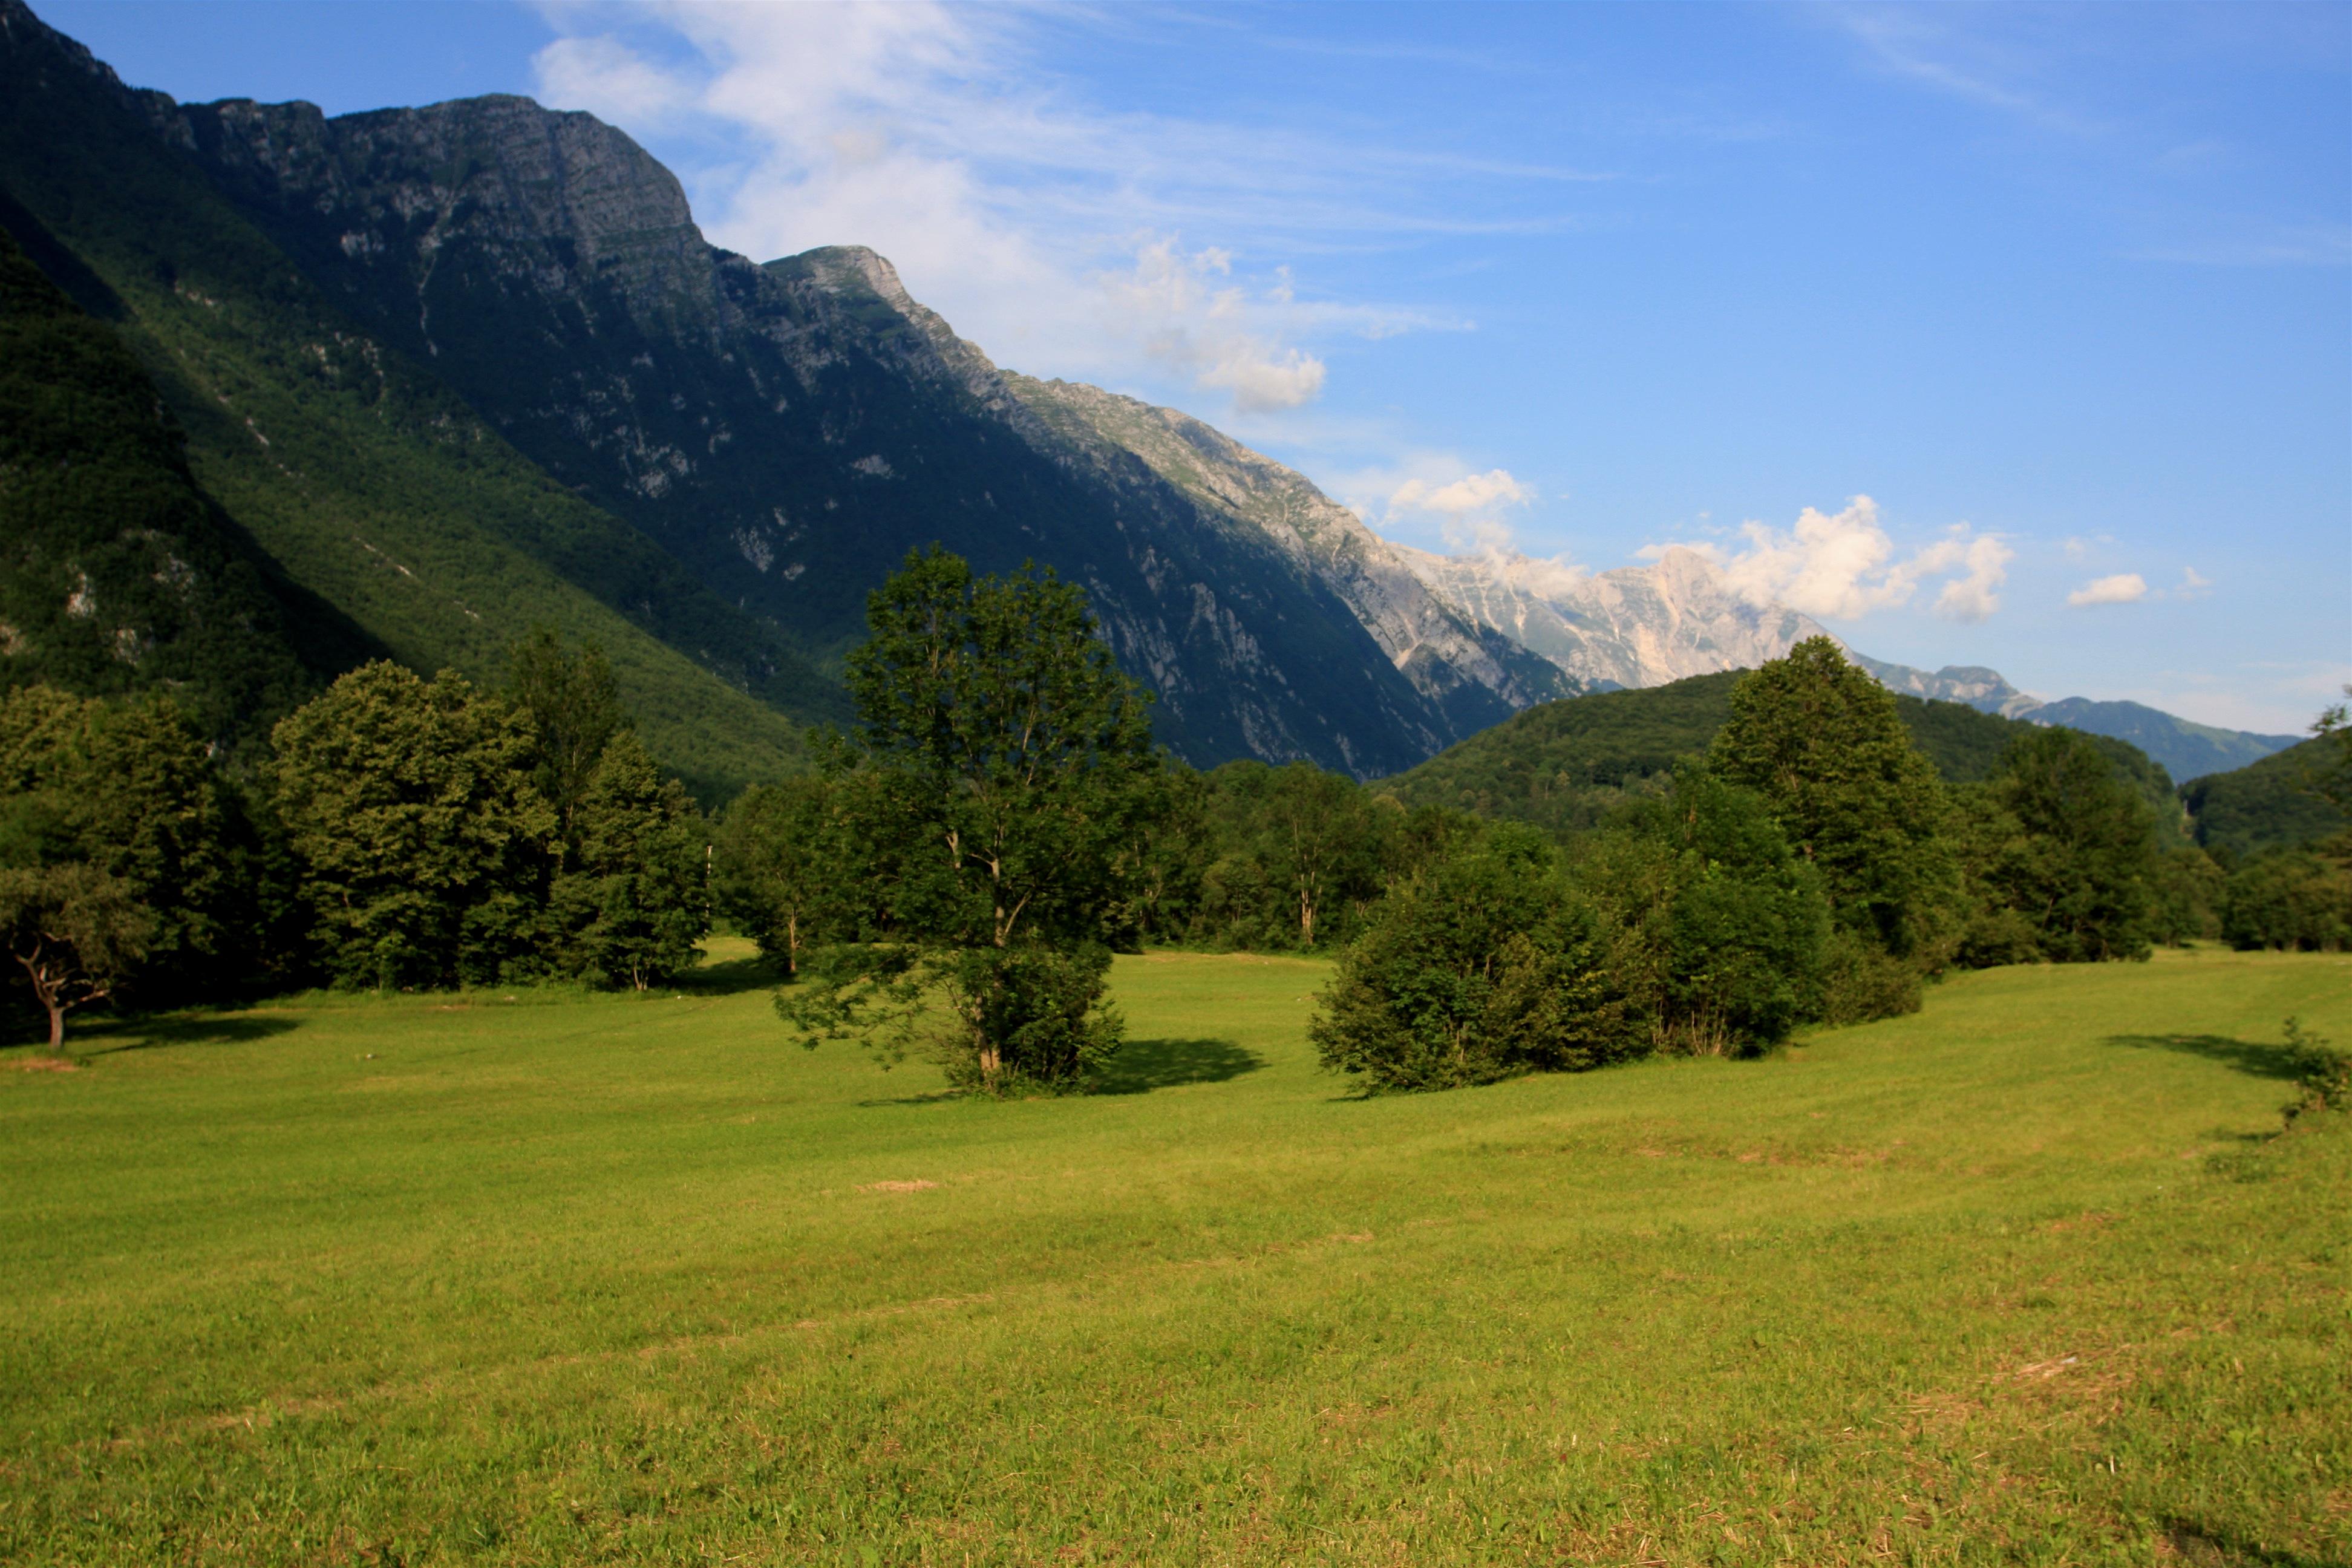 File:Julian Alps - Bovec, Slovenia (7451229734).jpg - Wikimedia ...